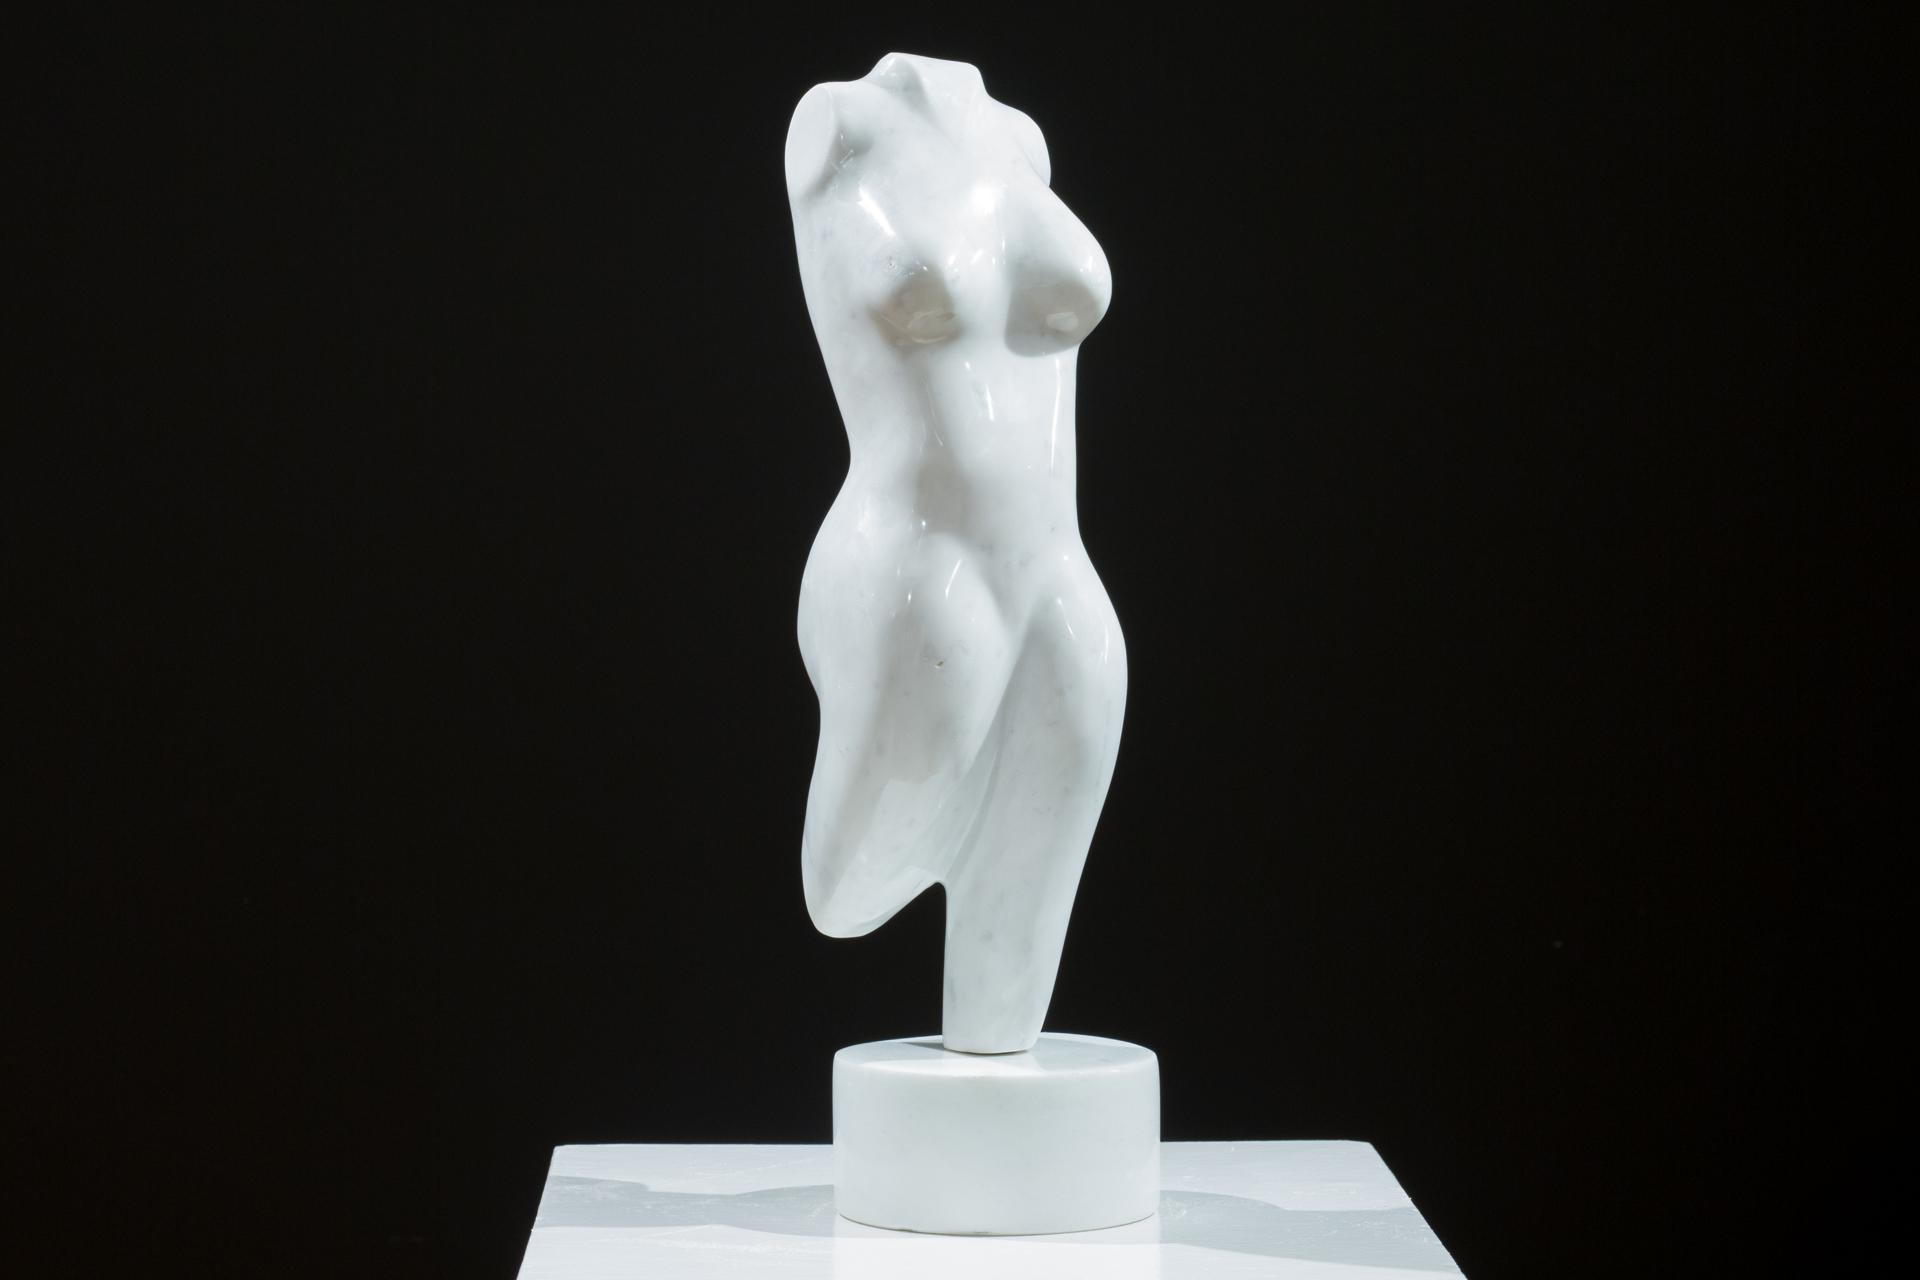 Torso 28 by Gert Olsen